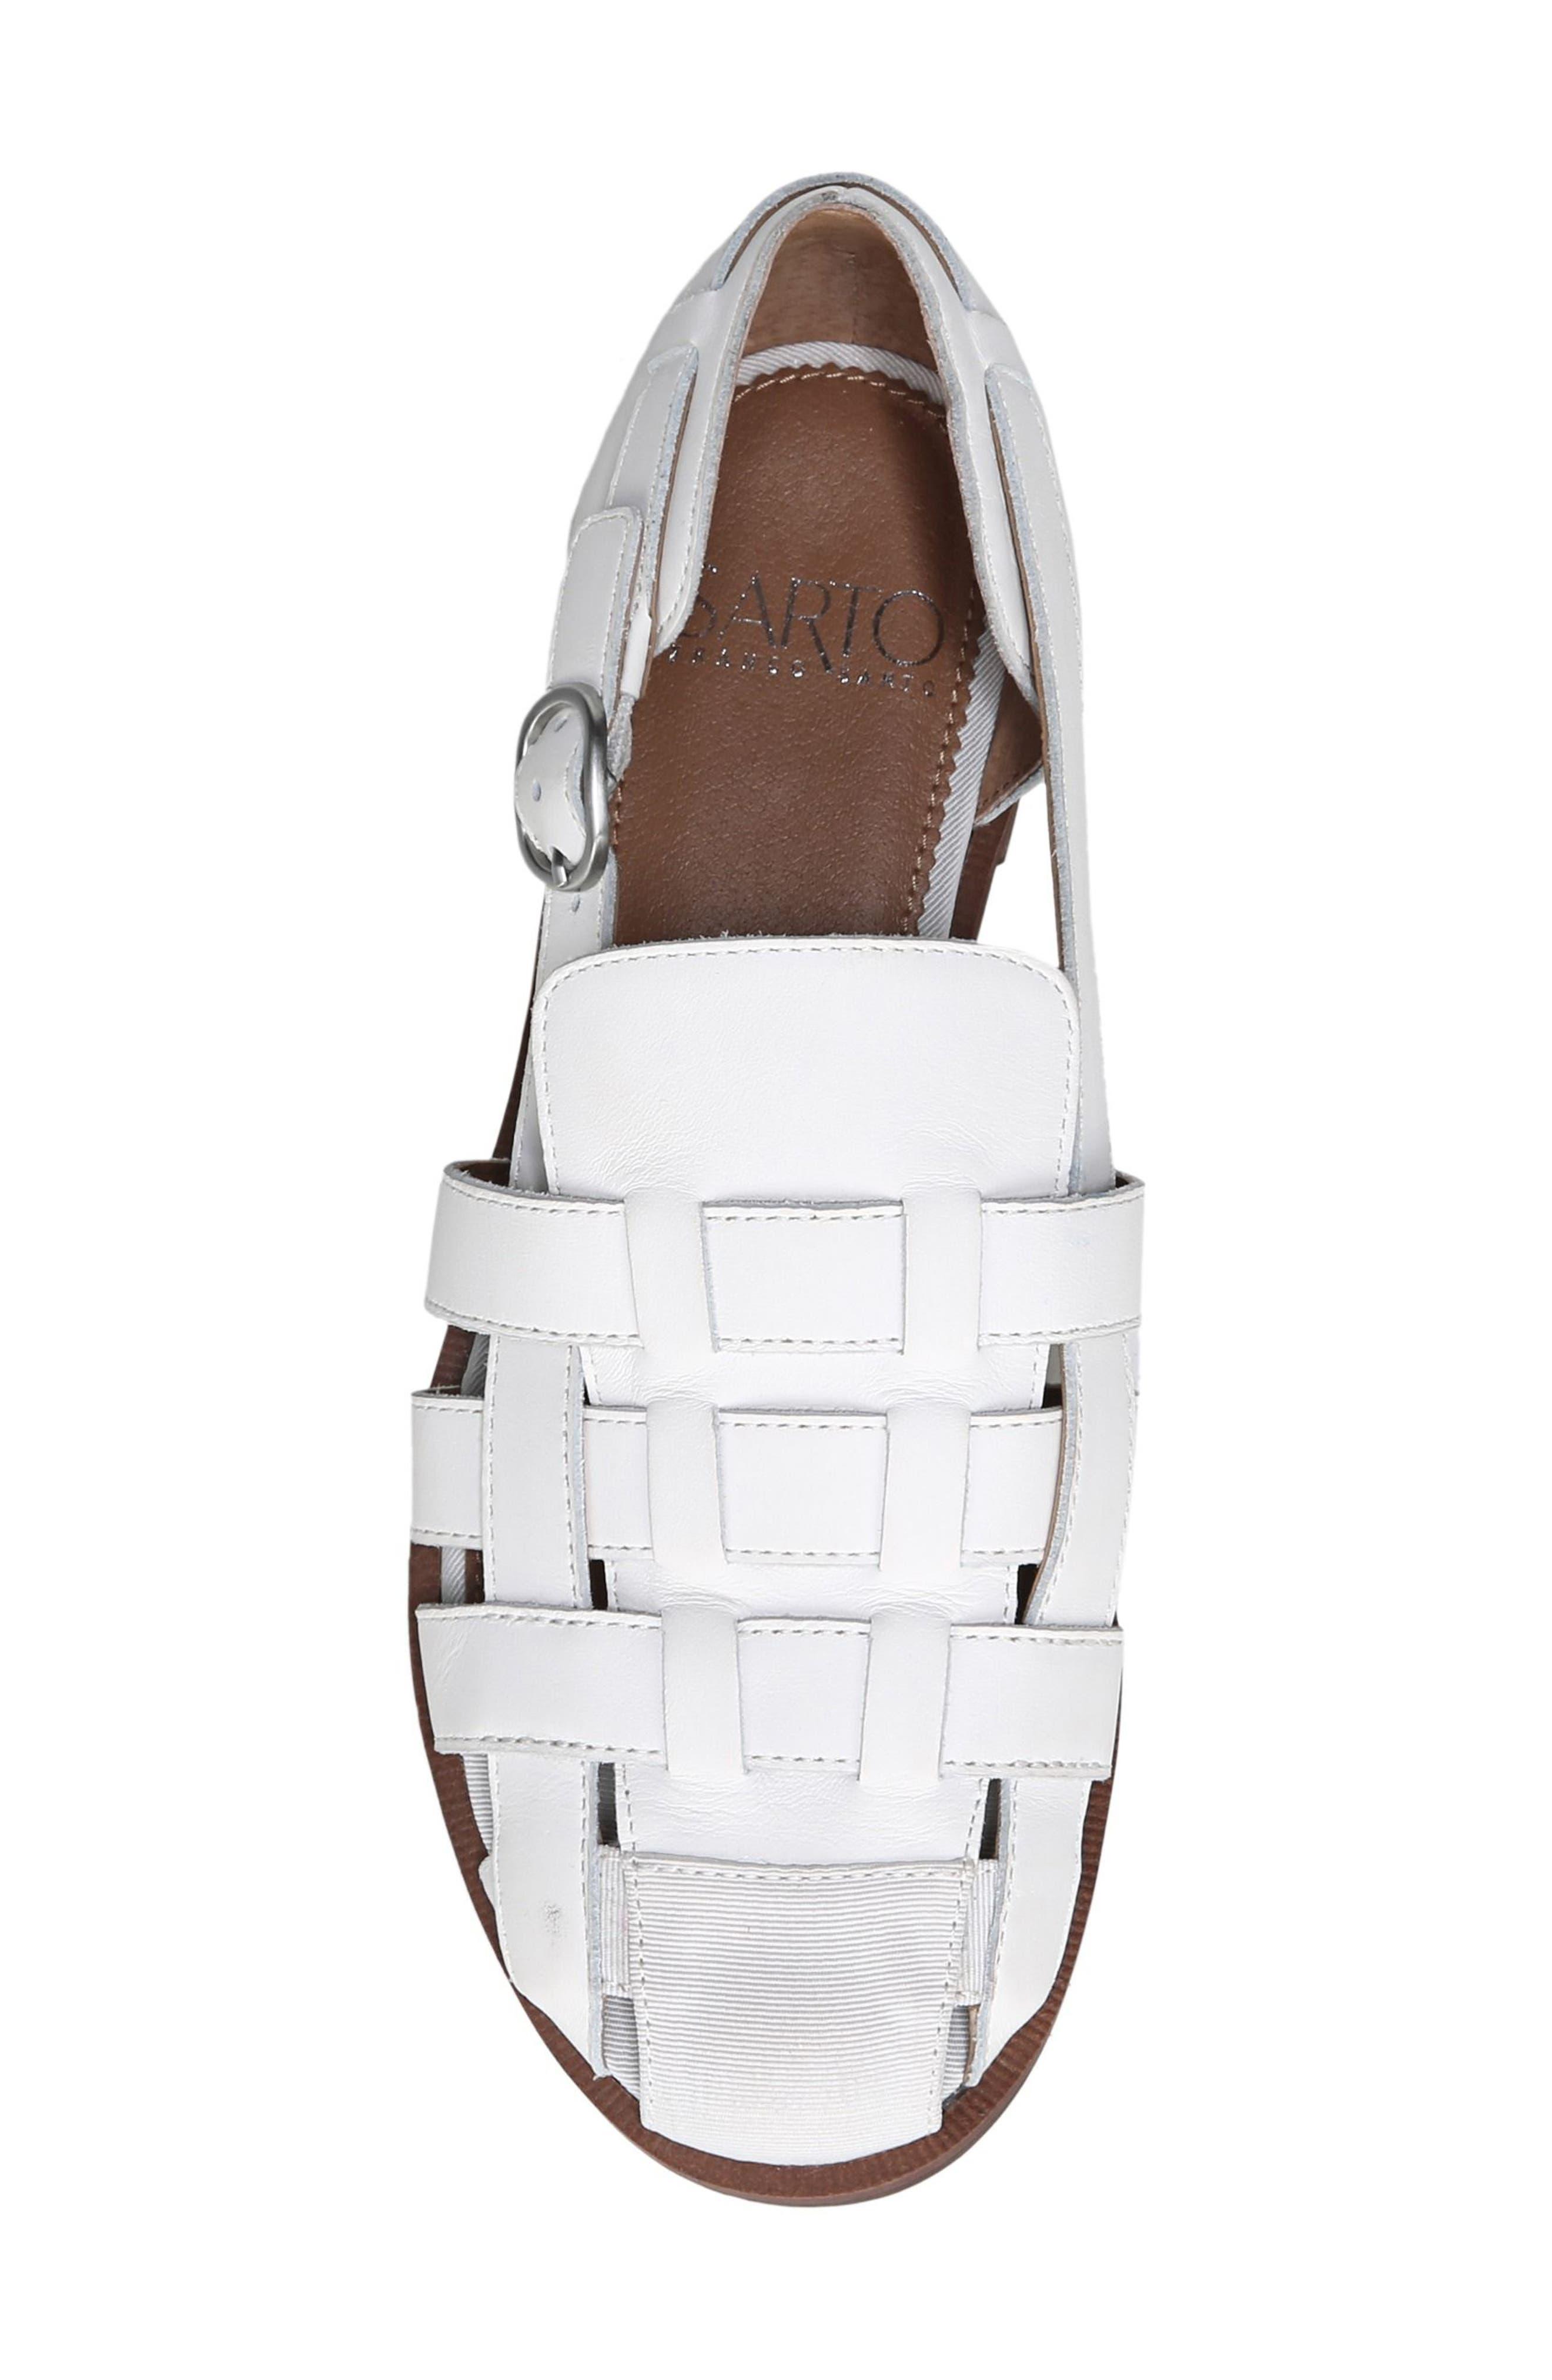 Lulu Fisherman Sandal,                             Alternate thumbnail 5, color,                             Bright White Leather